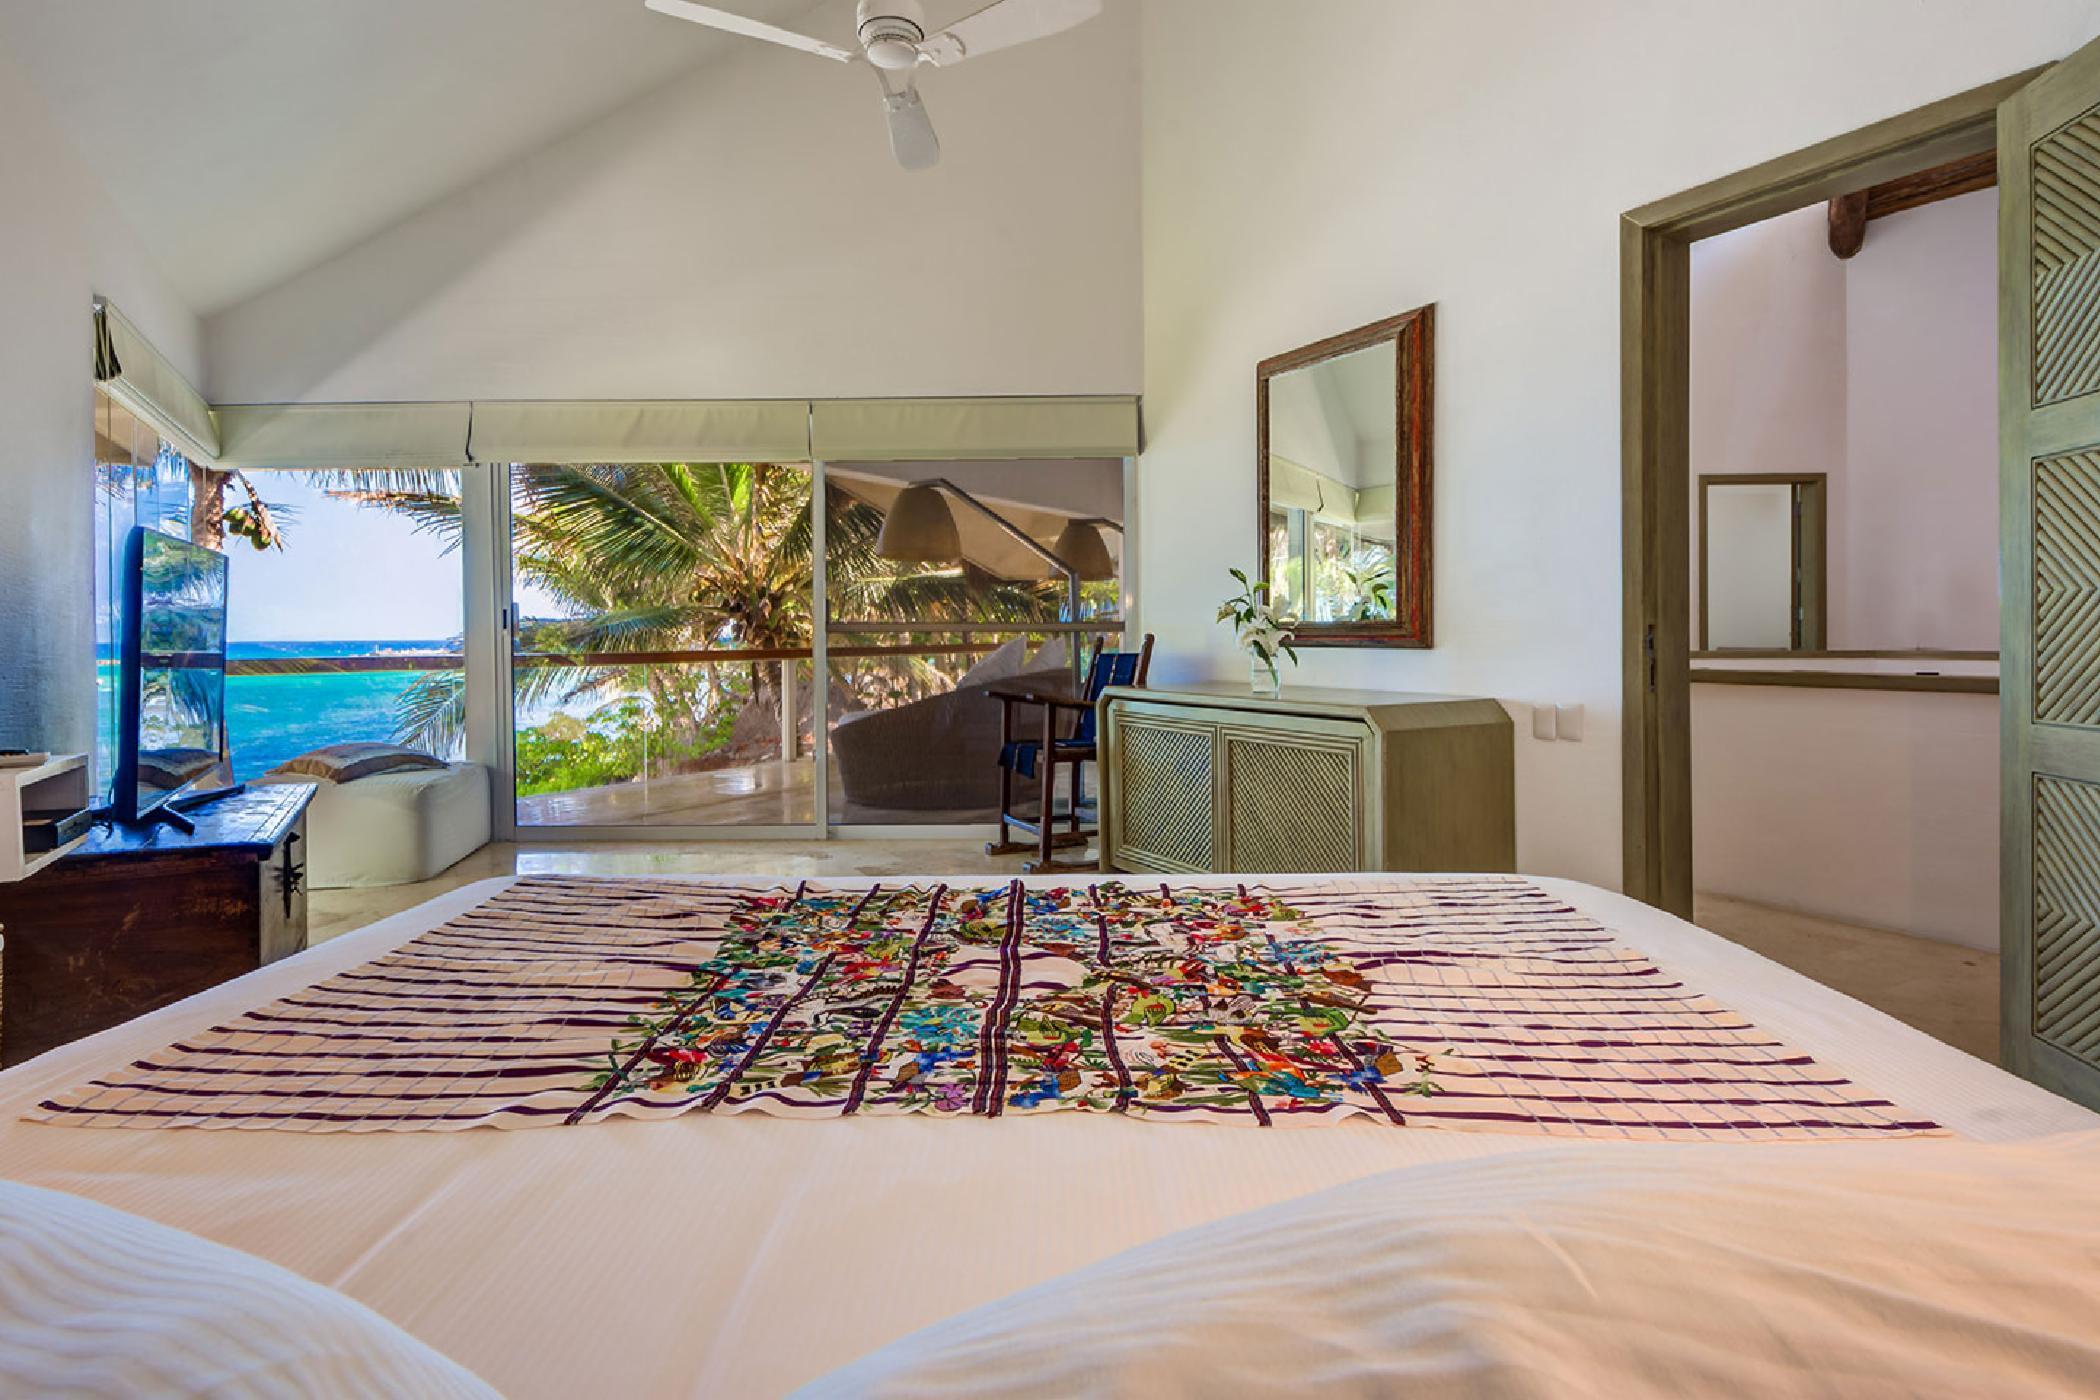 Maya_Luxe_Riviera_Maya_Luxury_Villas_Experiences_Puerto_Aventuras_5_Bedrooms_Zacil_Na_13.jpg